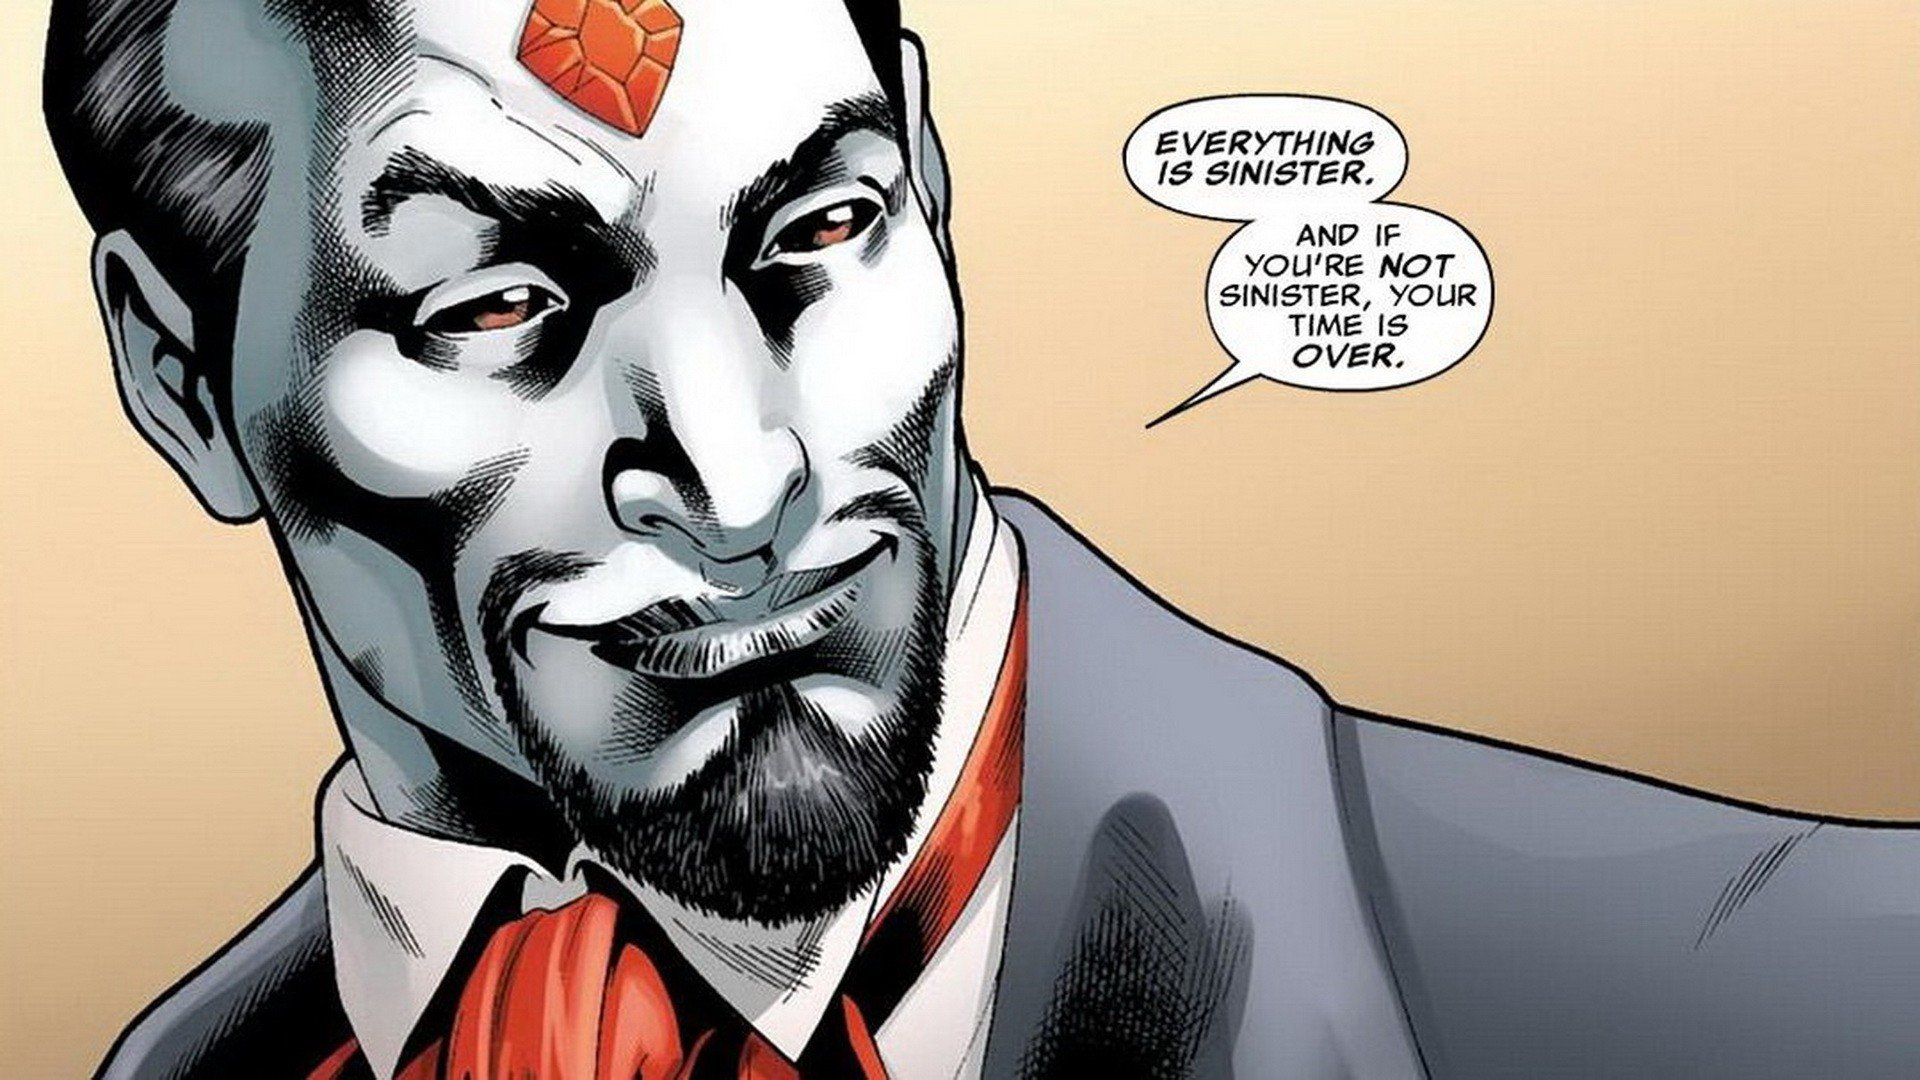 Comics X-Men Marvel Comics Mr_ Sinister Sinister wallpaper   1920x1080   334456   WallpaperUP